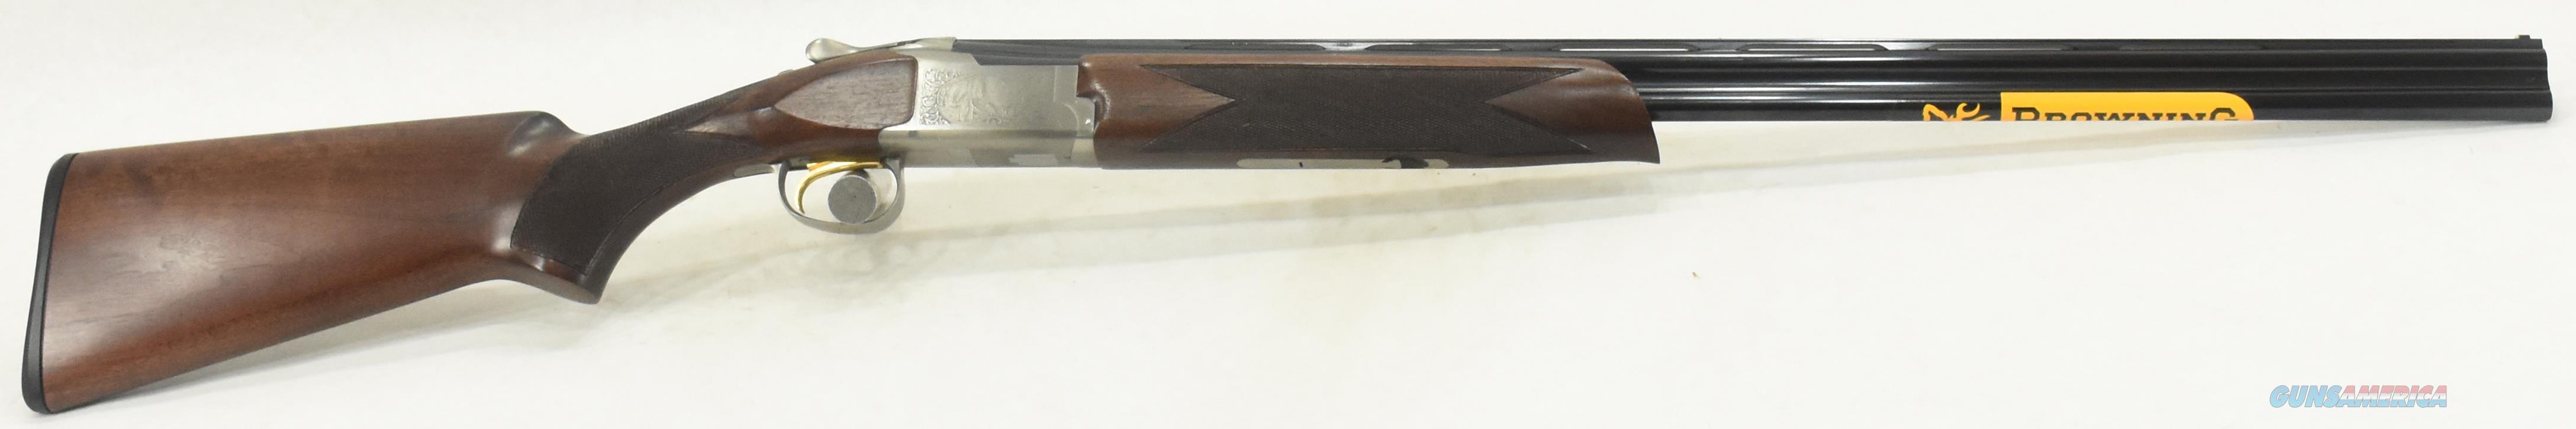 Citori 725 Field Walnut 410Ga 28-3In  013530913  Guns > Shotguns > Browning Shotguns > Over Unders > Citori > Hunting